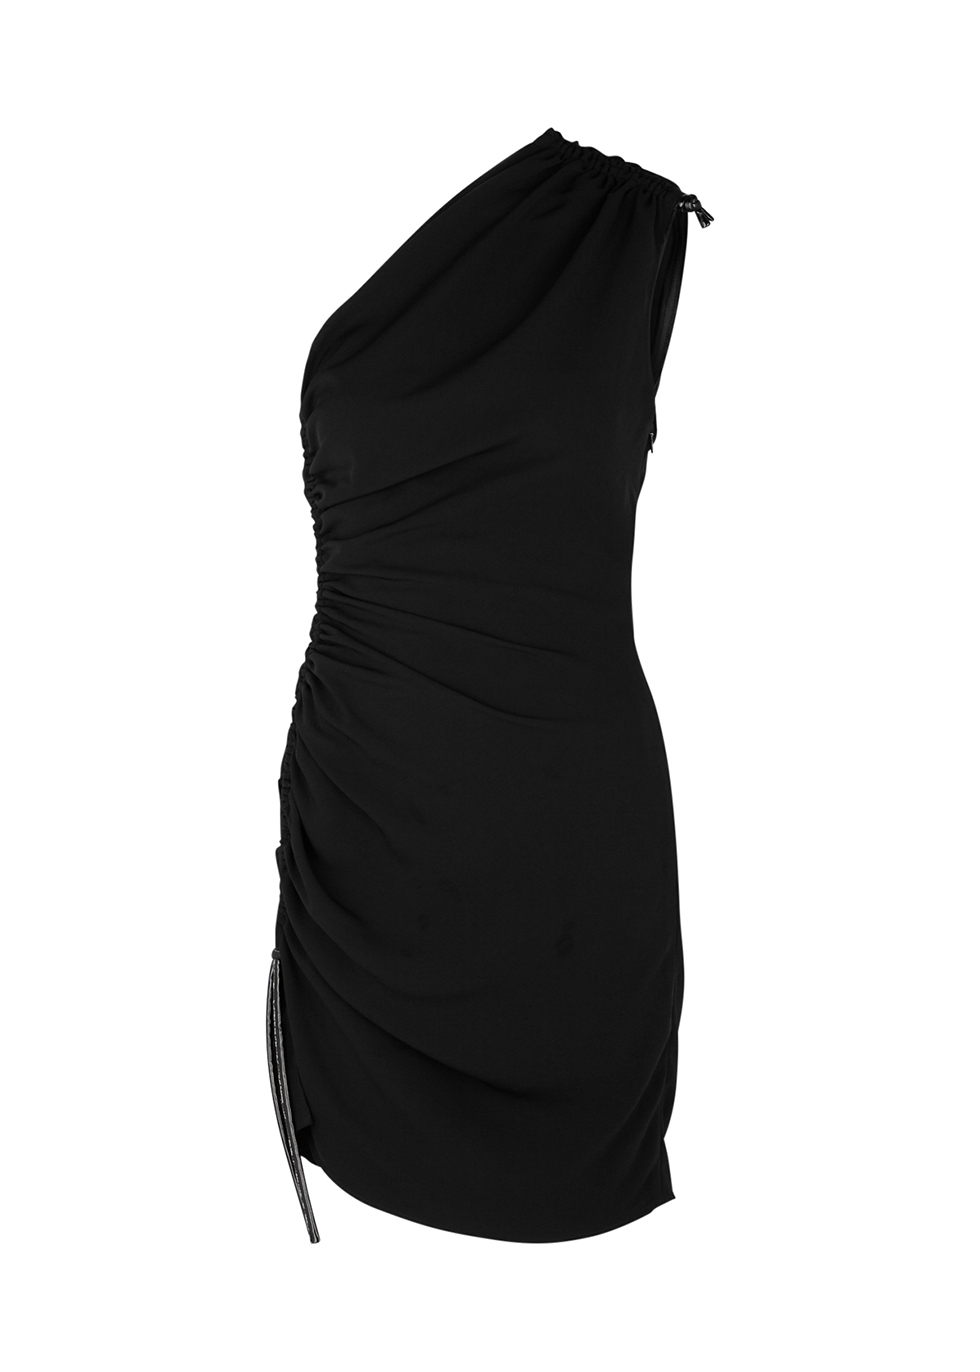 Rogers black one-shoulder mini dress